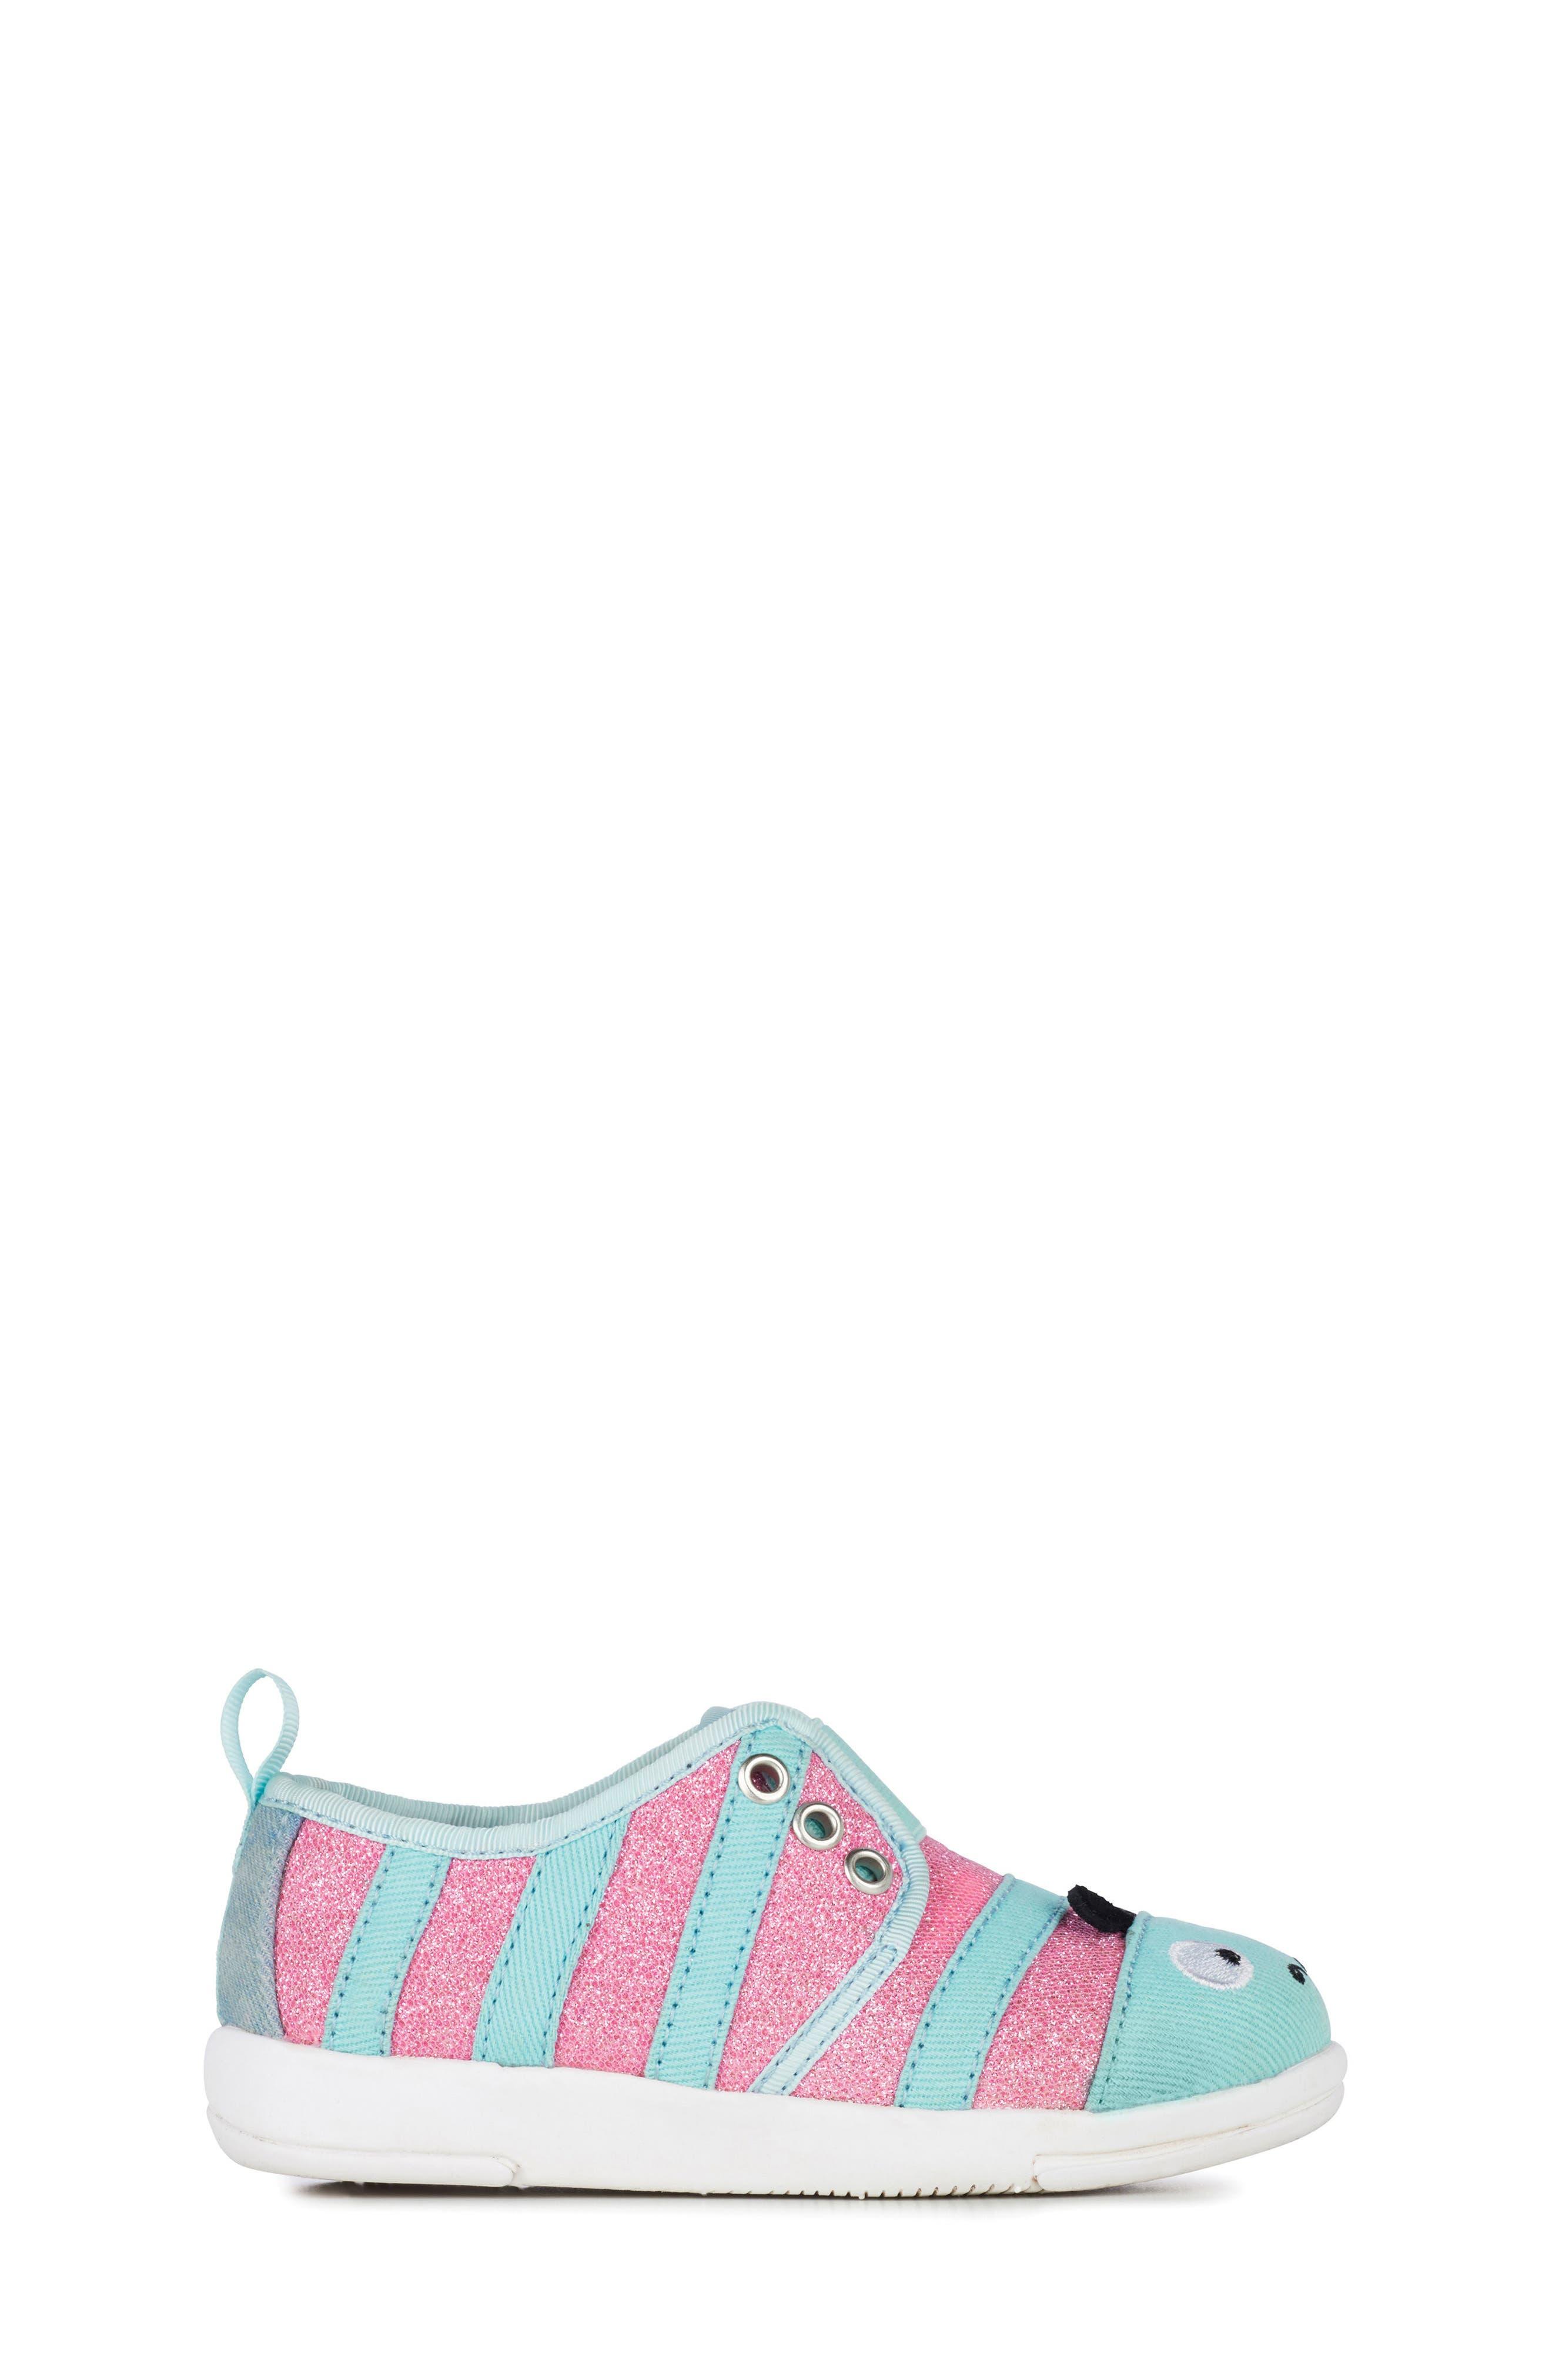 Alternate Image 3  - EMU Australia Caterpillar Laceless Sneaker (Toddler, Little Kid & Big Kid)